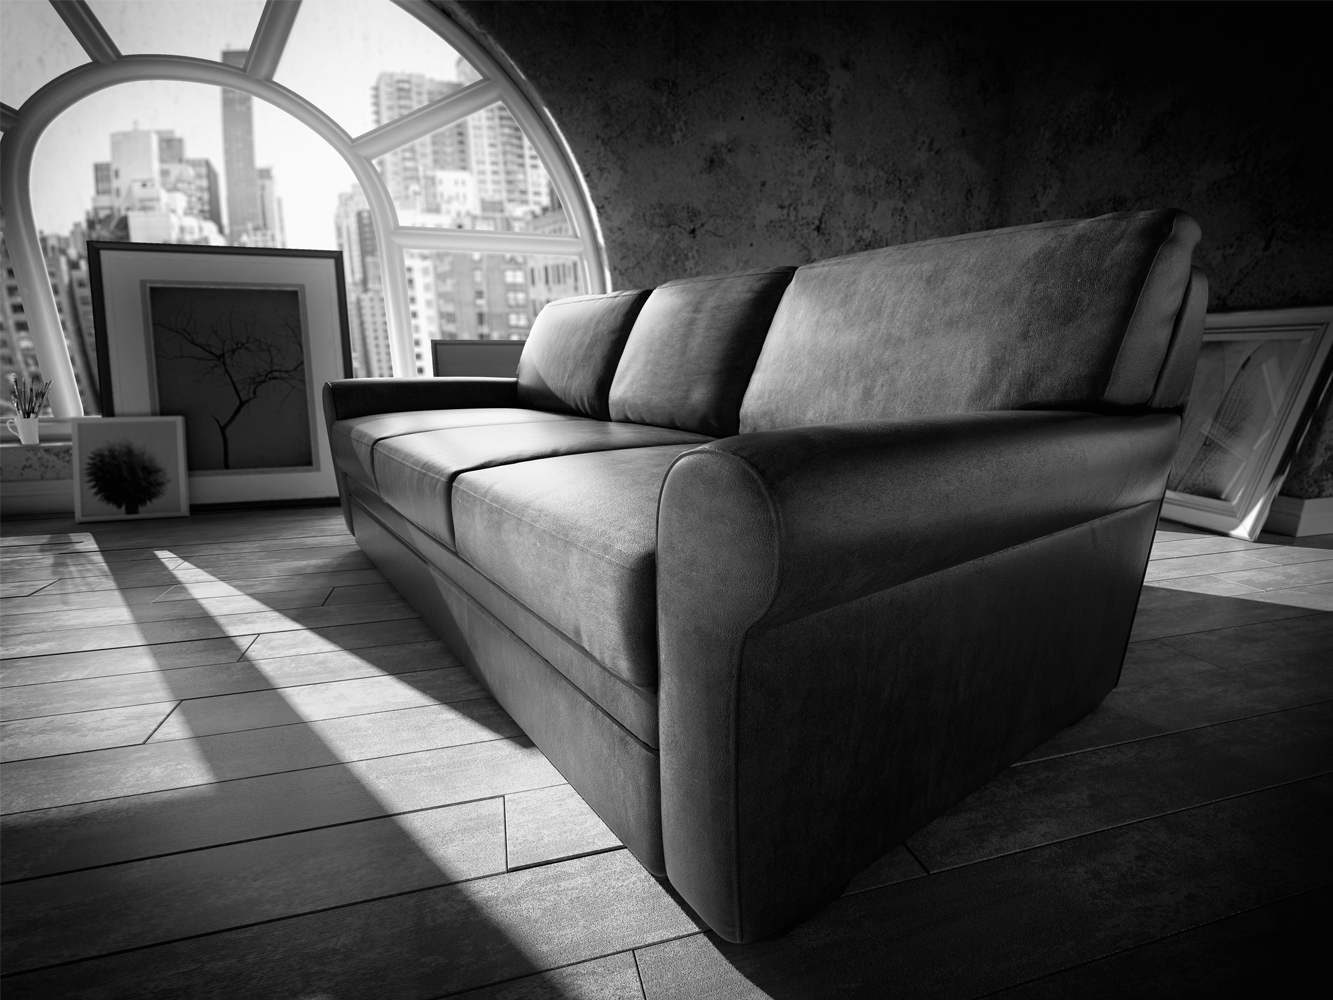 pix-us-leather-sofa